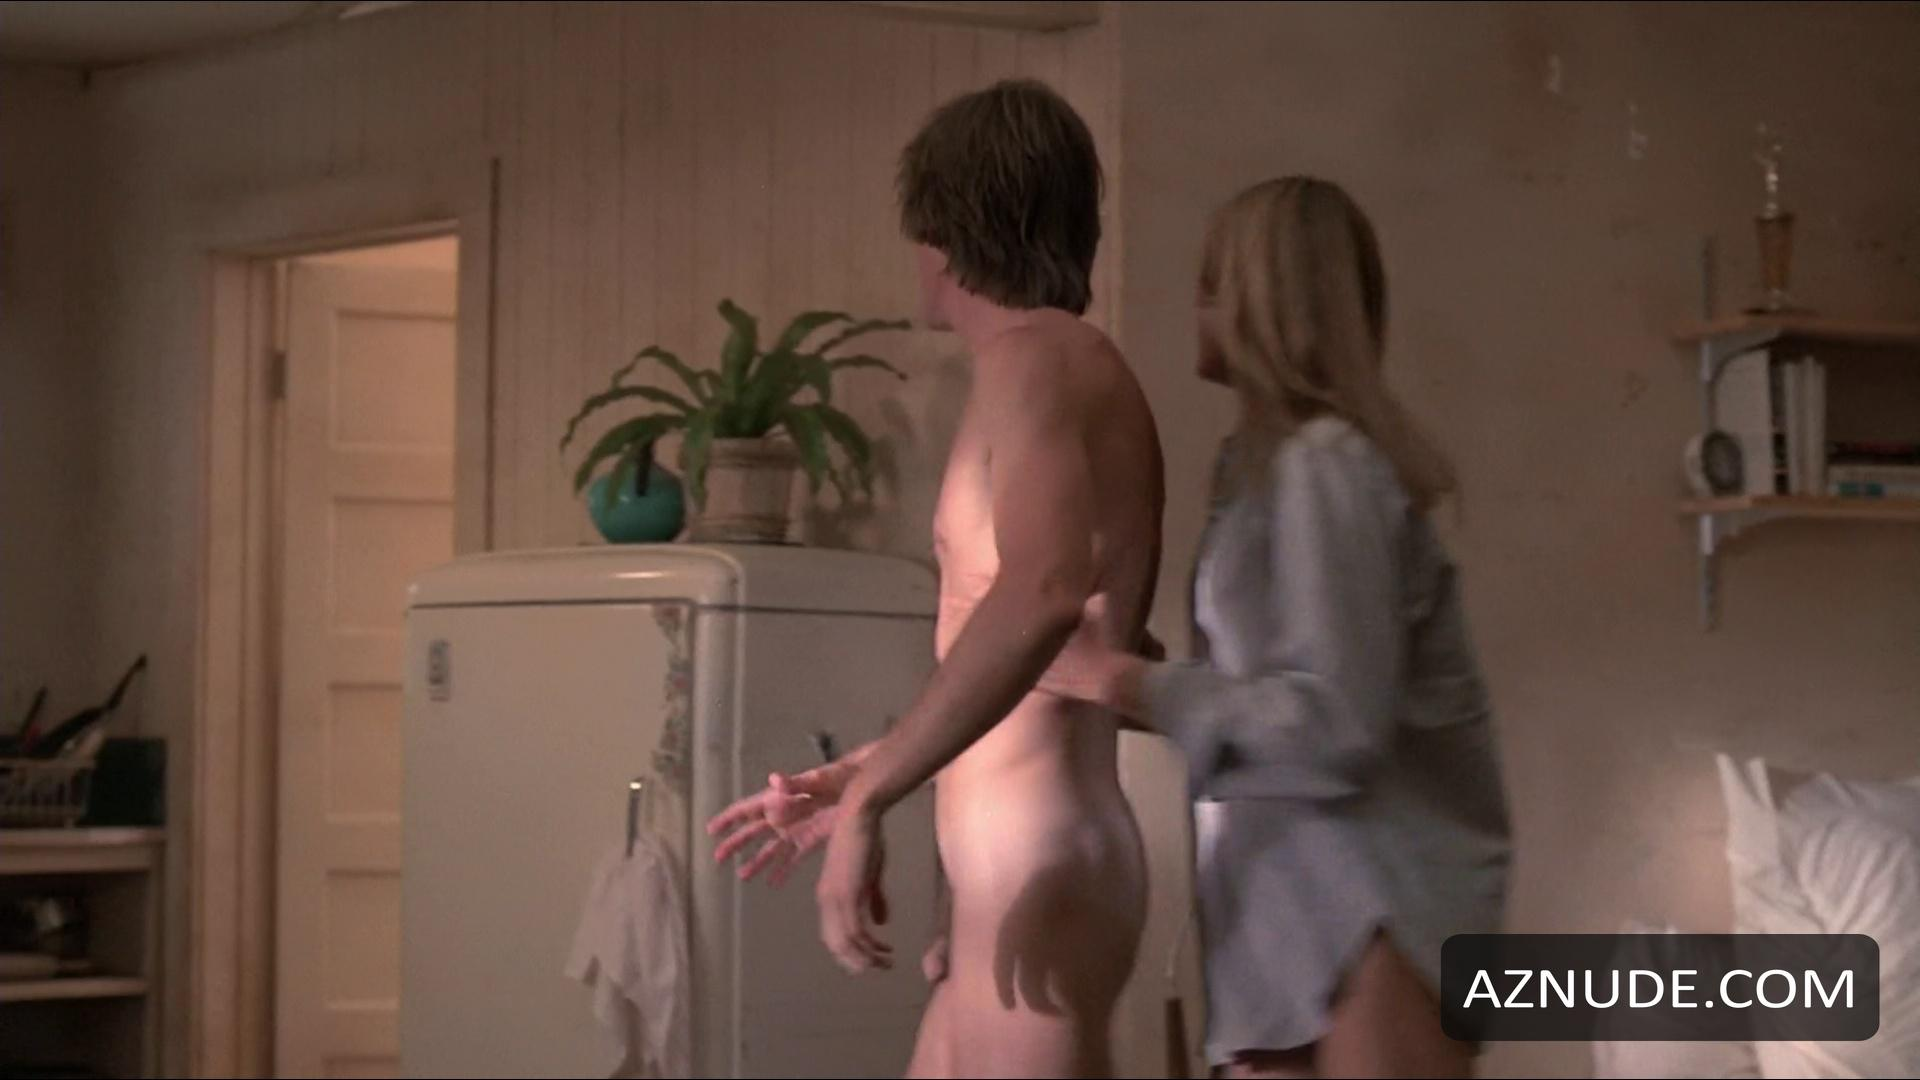 Personal nude videos